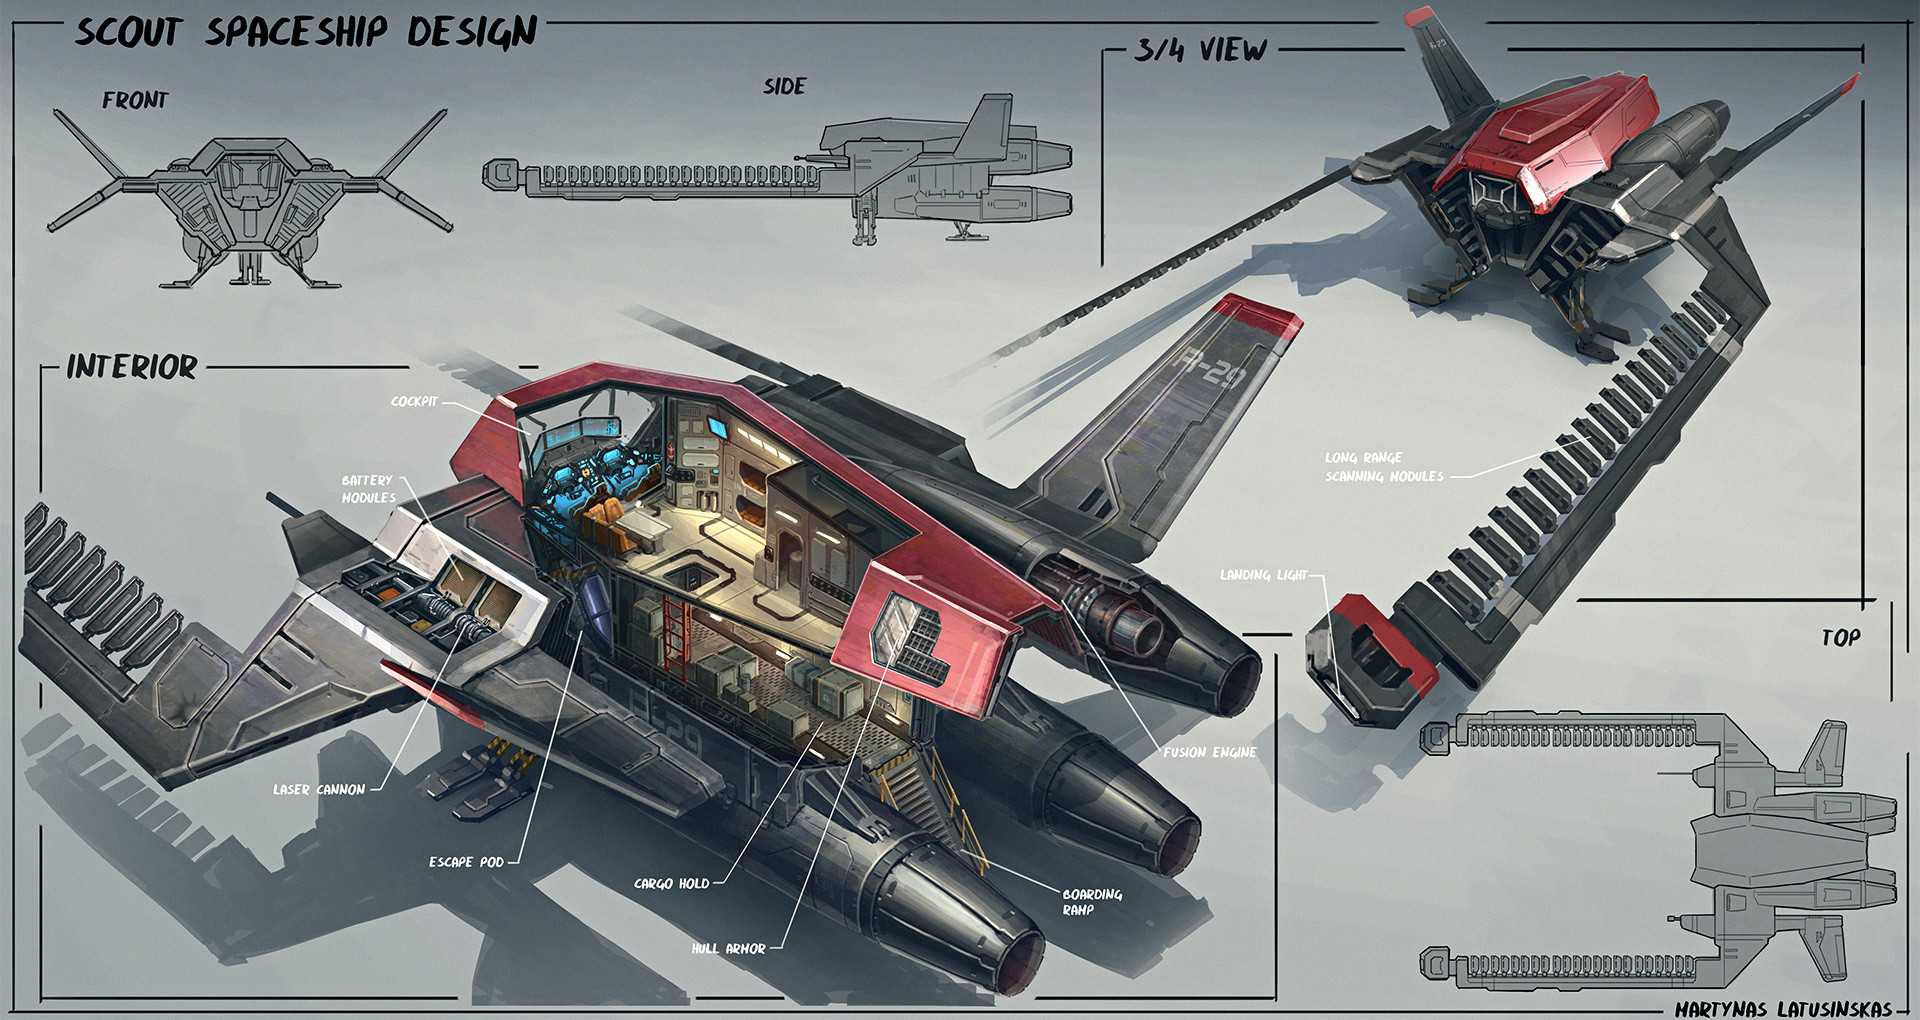 Martynas latusinskas scout spaceship design martynas latusinskas